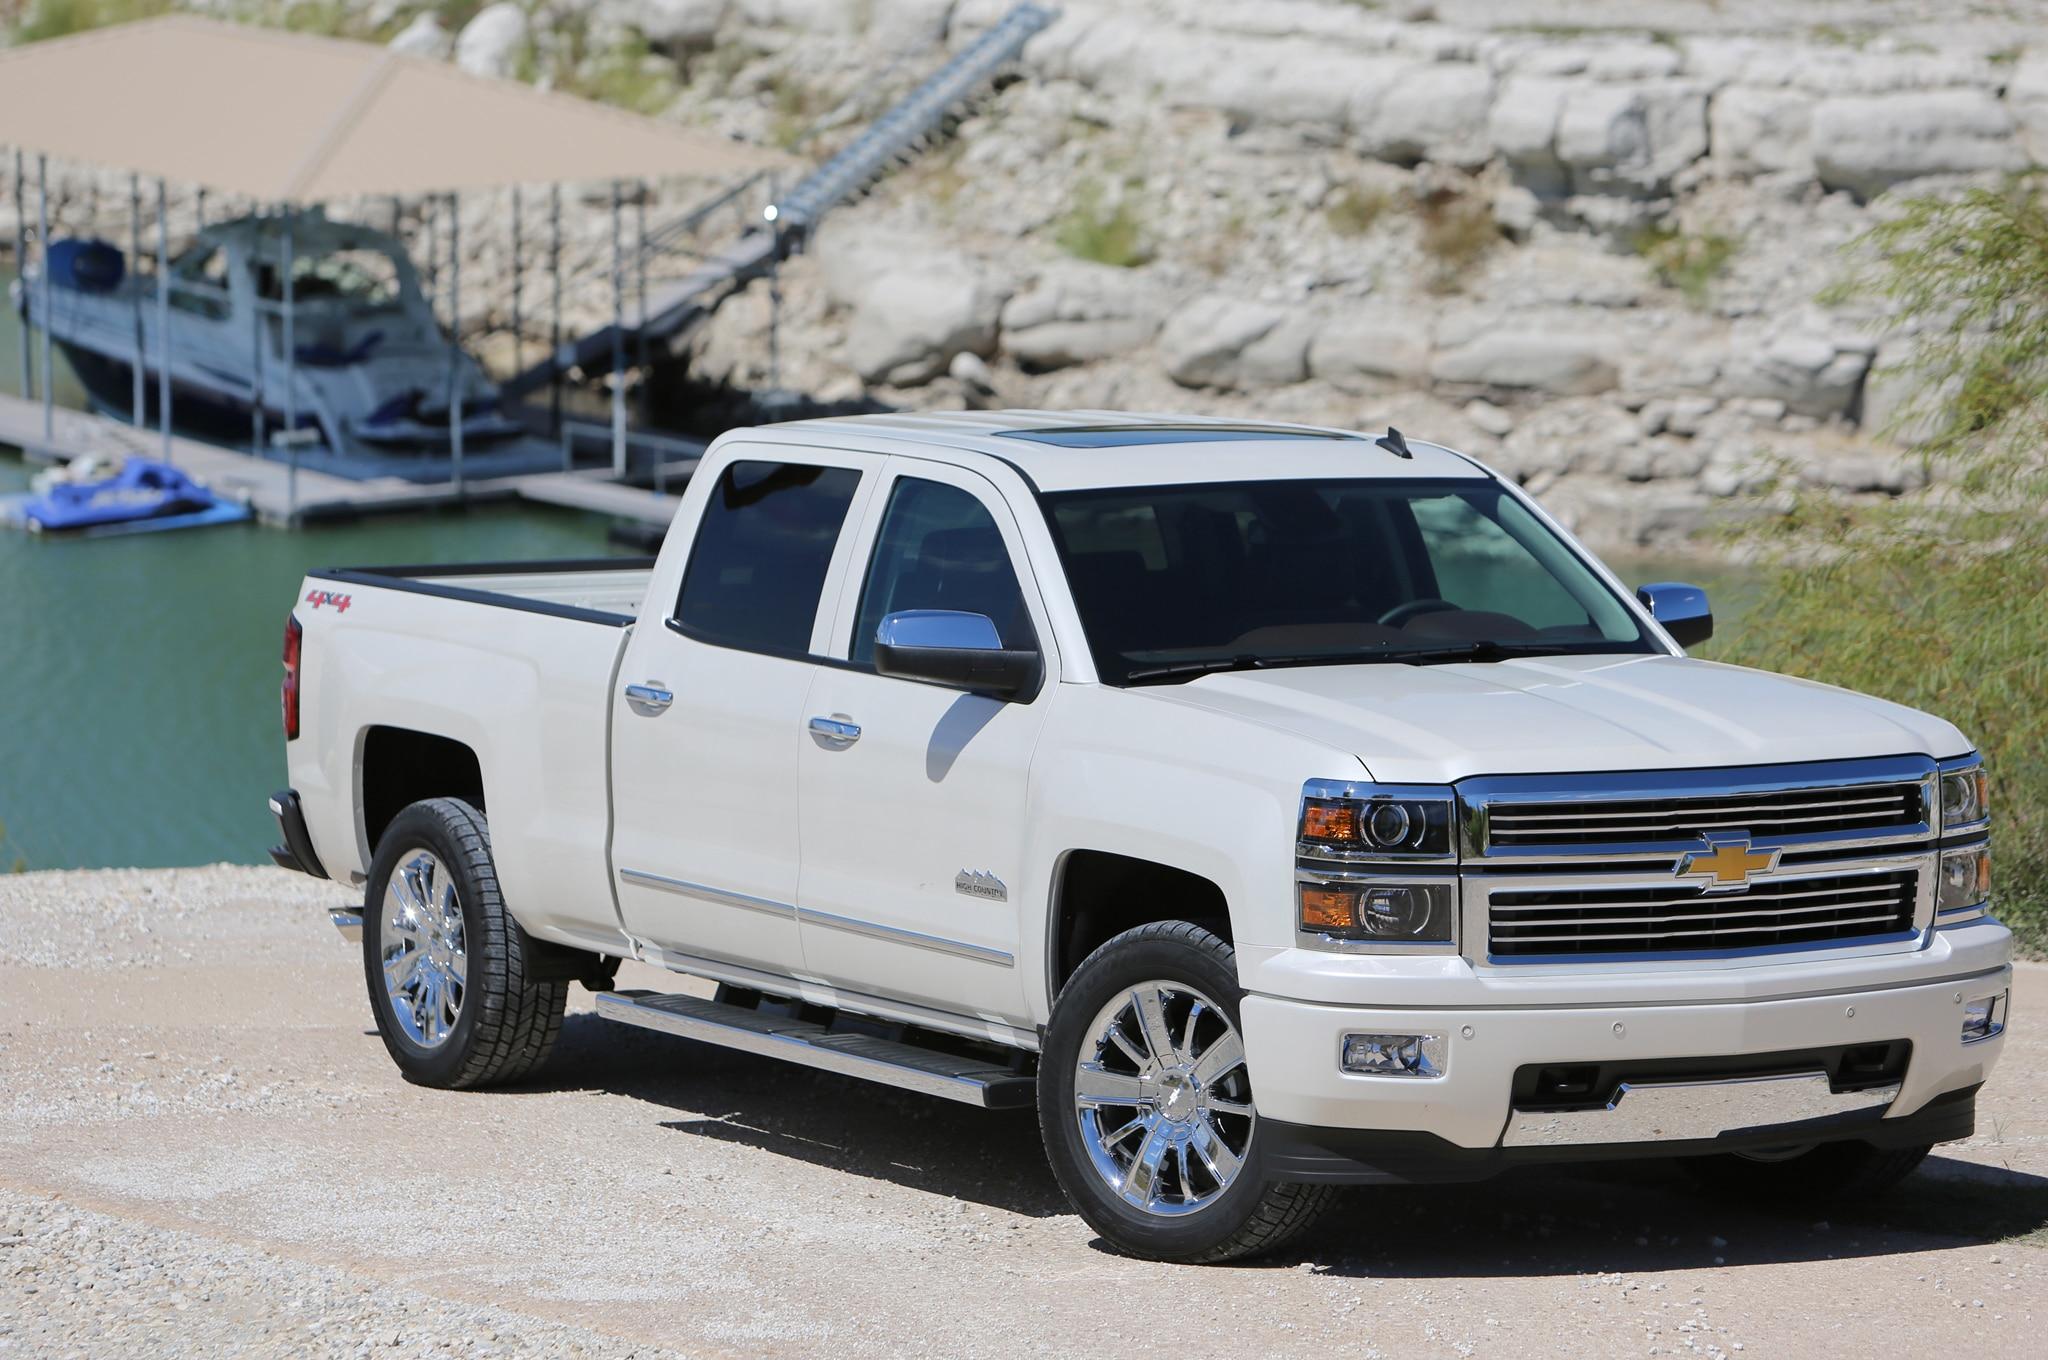 Recall Alert: 2014-2015 4x4 Chevy Silverado/GMC Sierra